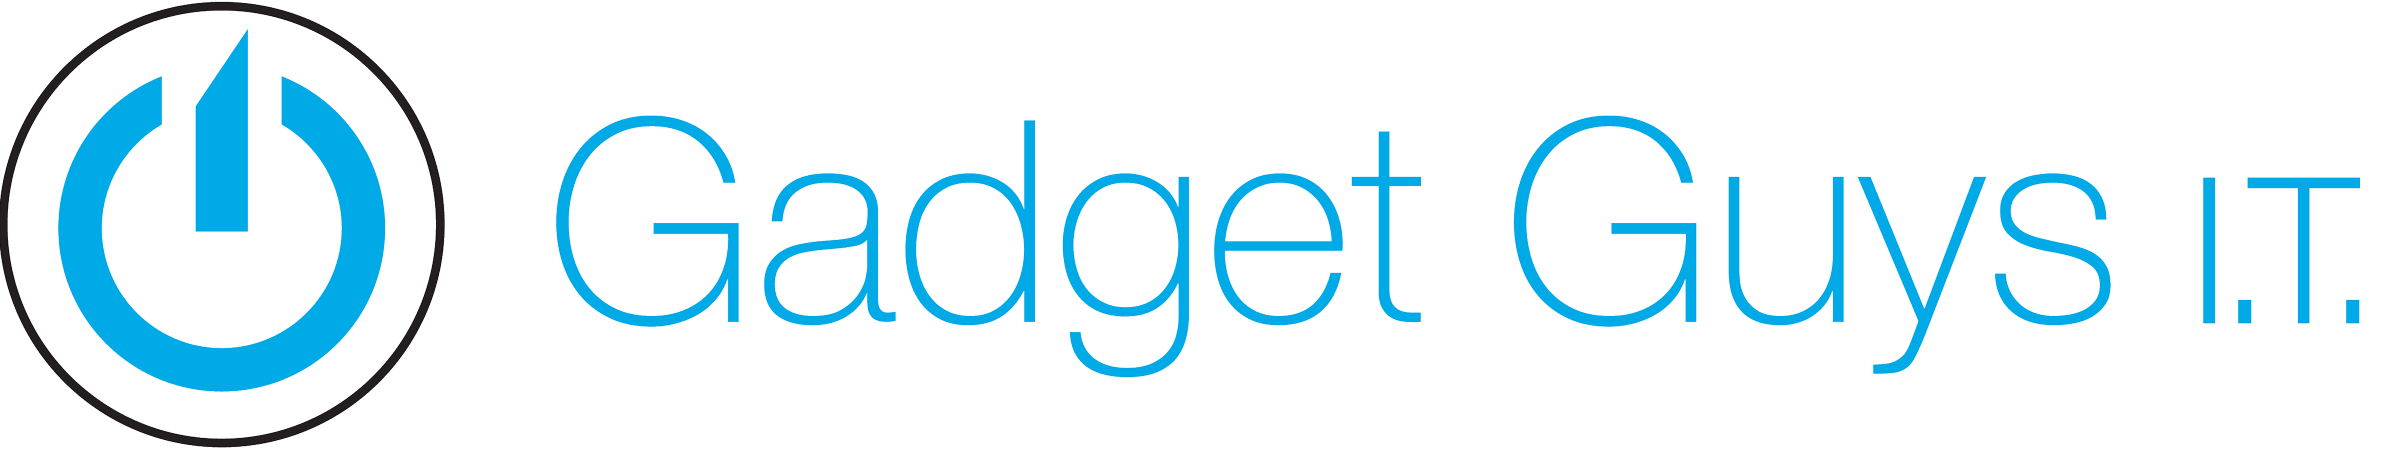 Gadget Guys I.T.